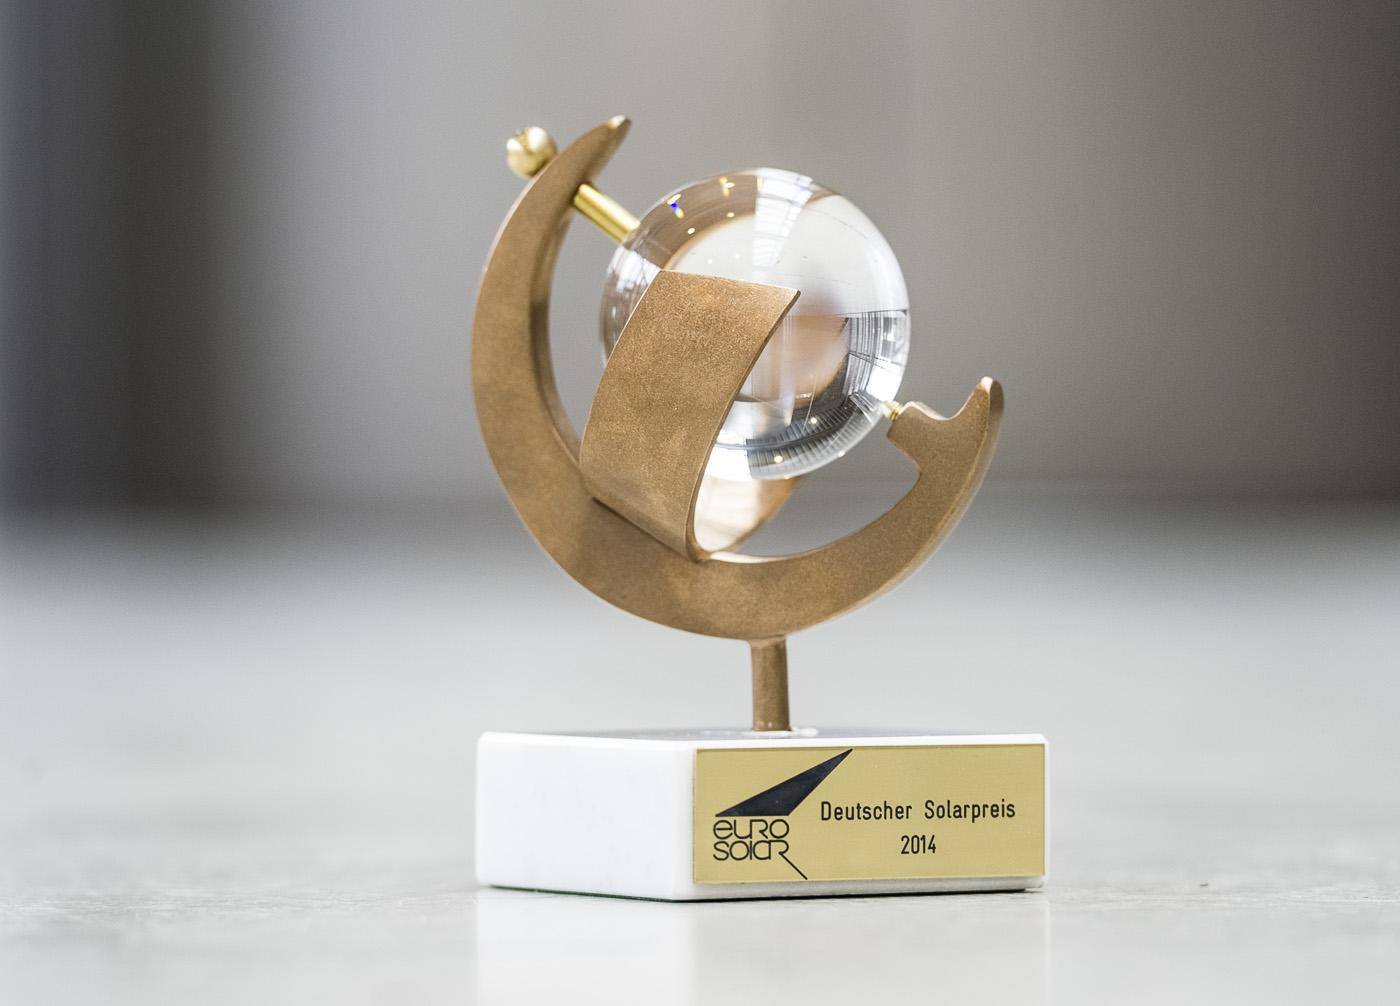 Solarpreis 2014